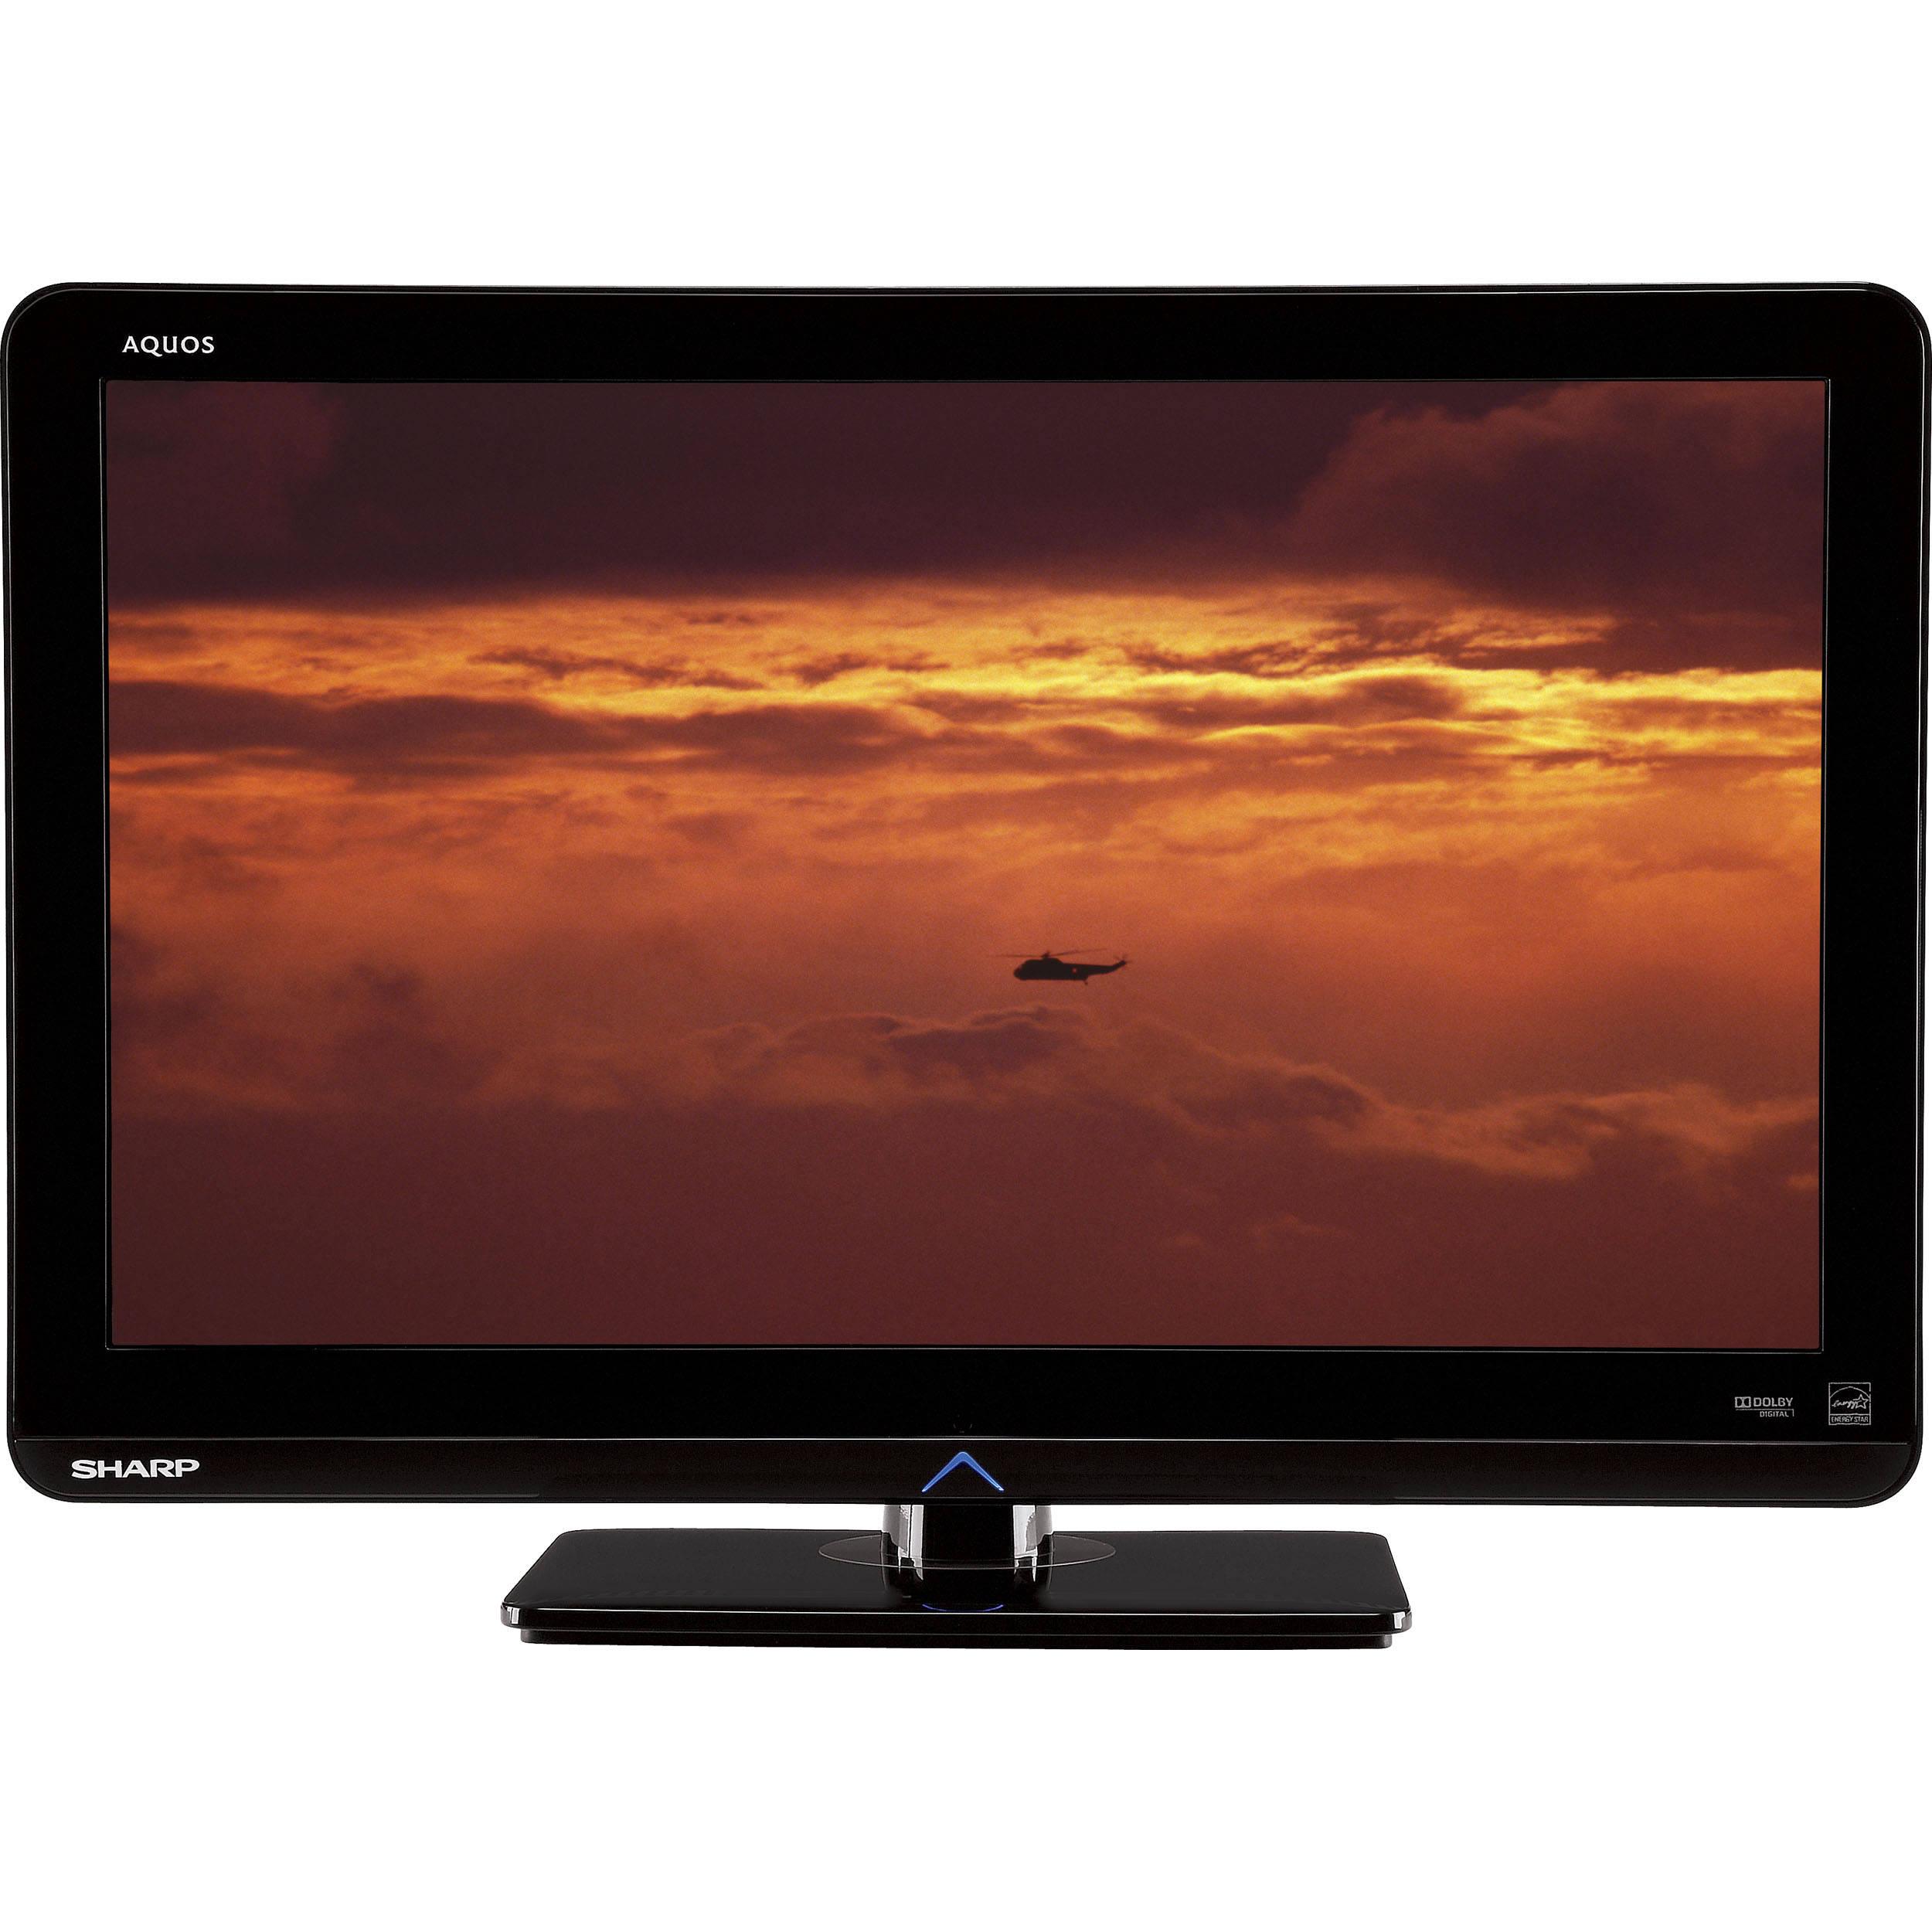 Sharp LC 22LS510U 22 1080p AQUOS LED LCD TV